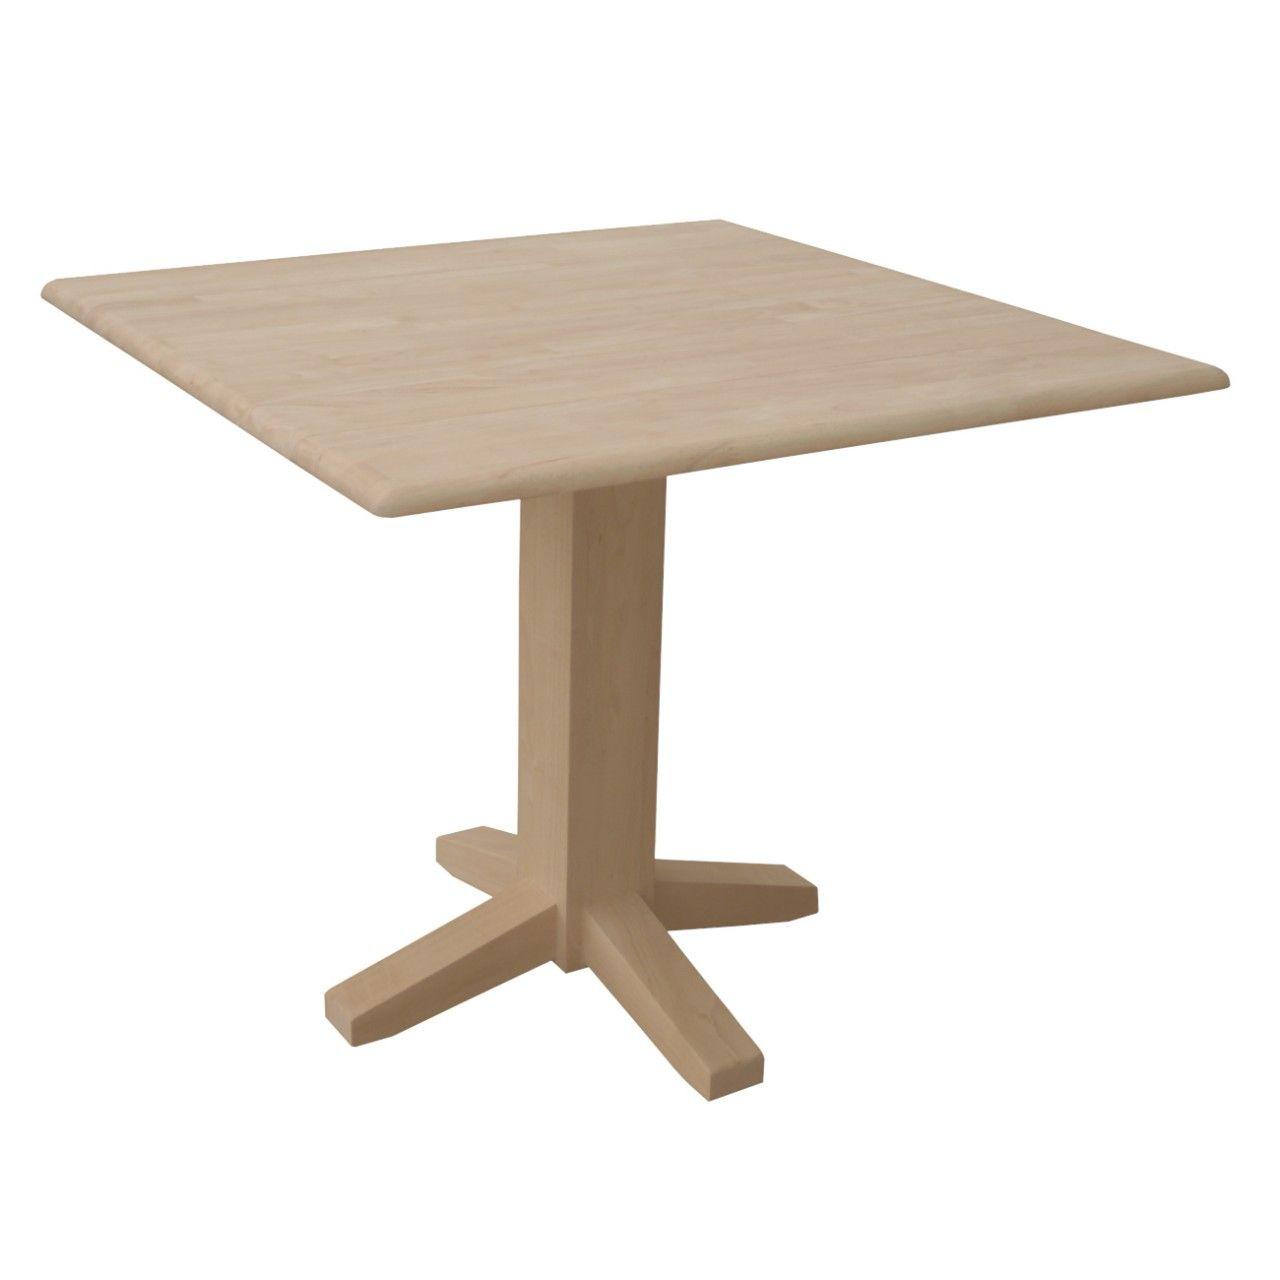 Unfinished Drop Leaf Square Pedestal Table 36 X 36 Wwt36sdp